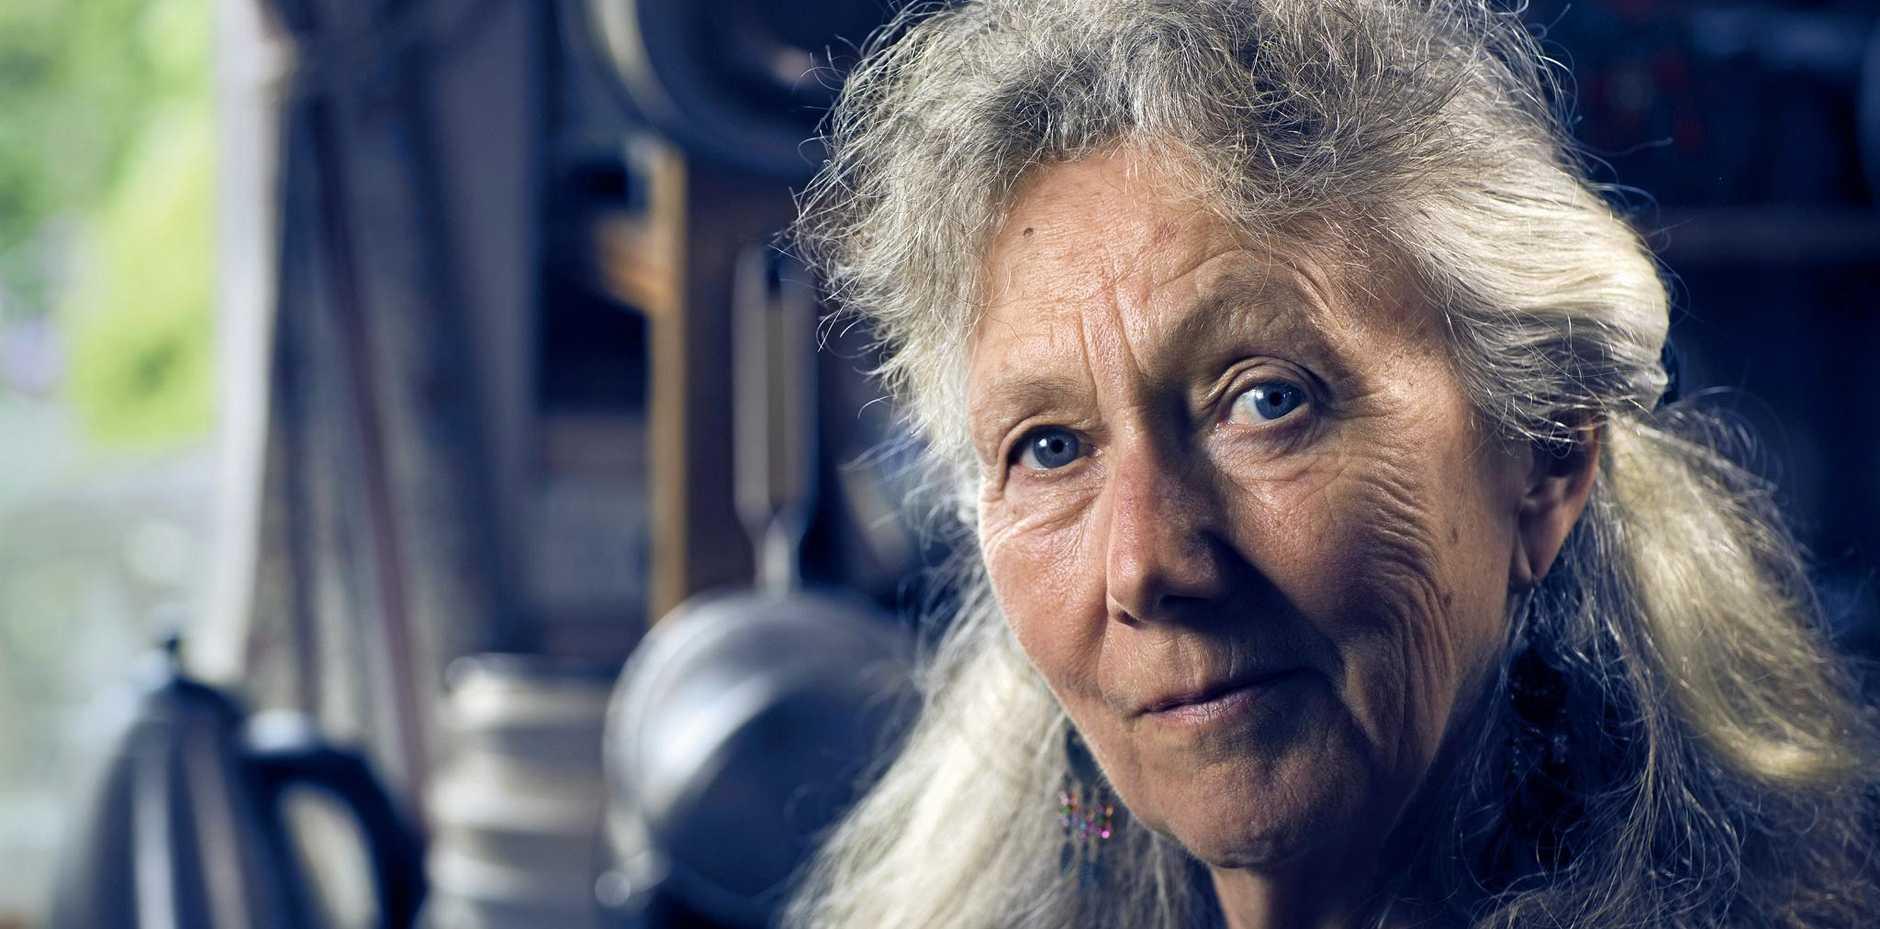 Senior Australian of the Year Award 2017 national finalist, Margaret Steadman.